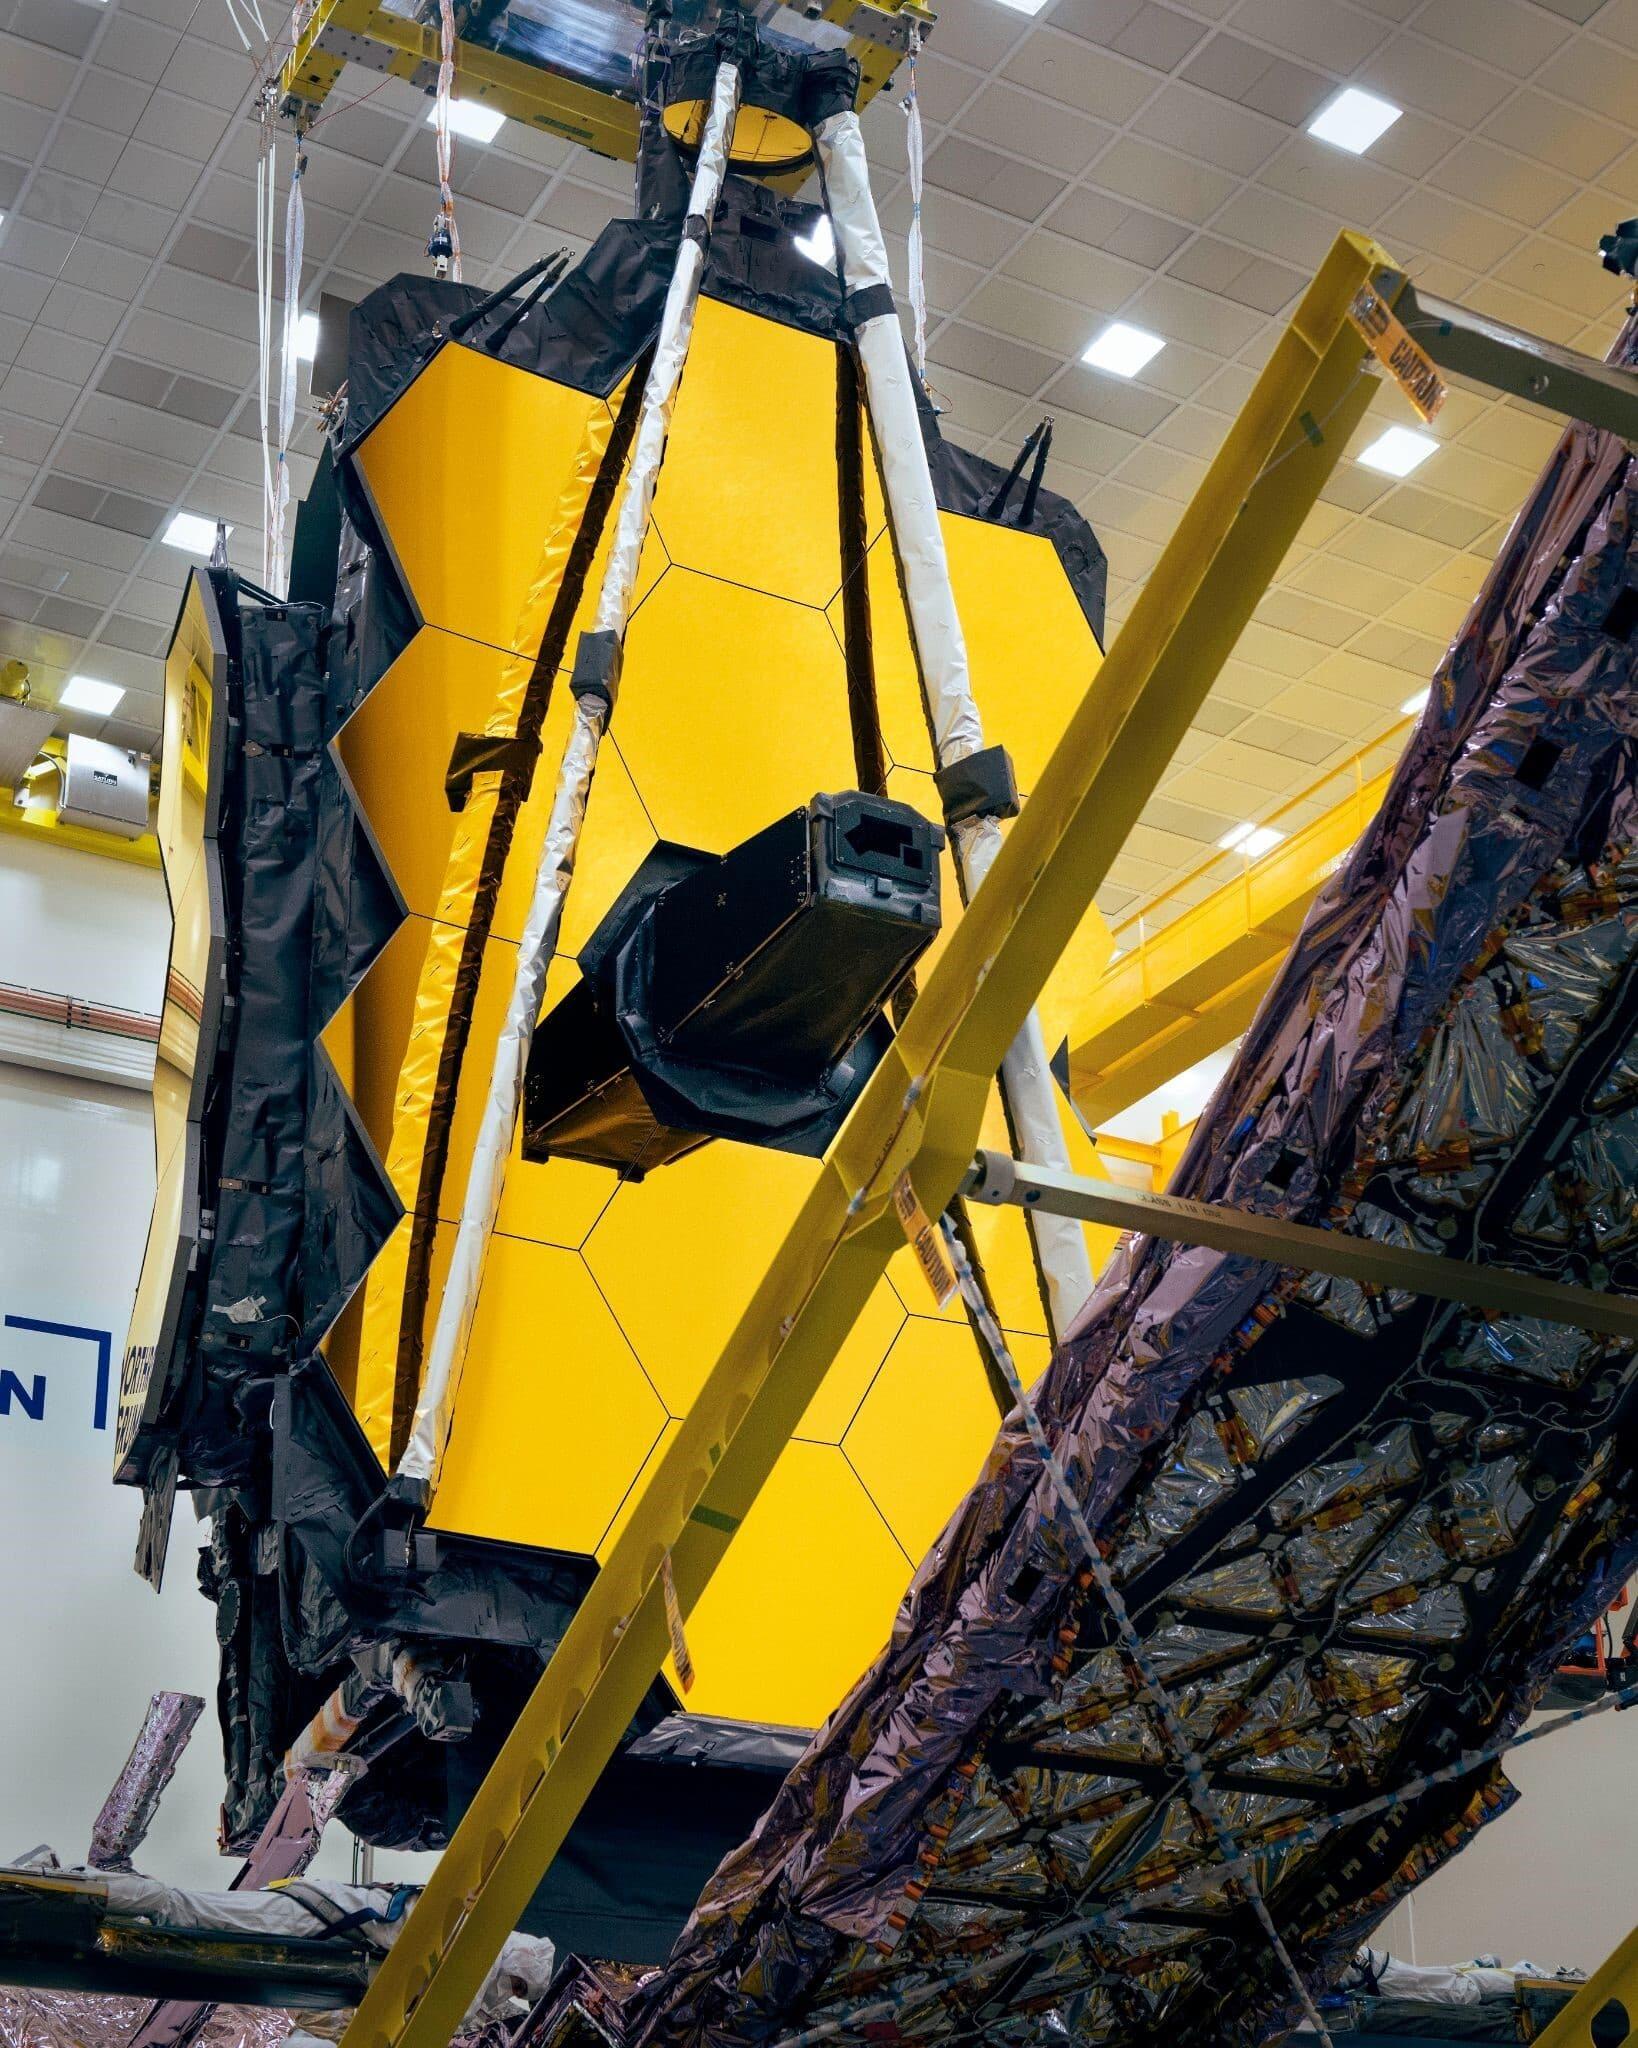 Launch of JWST Inches Closer as Northrop Grumman Begins to Button Up the Spacecraft